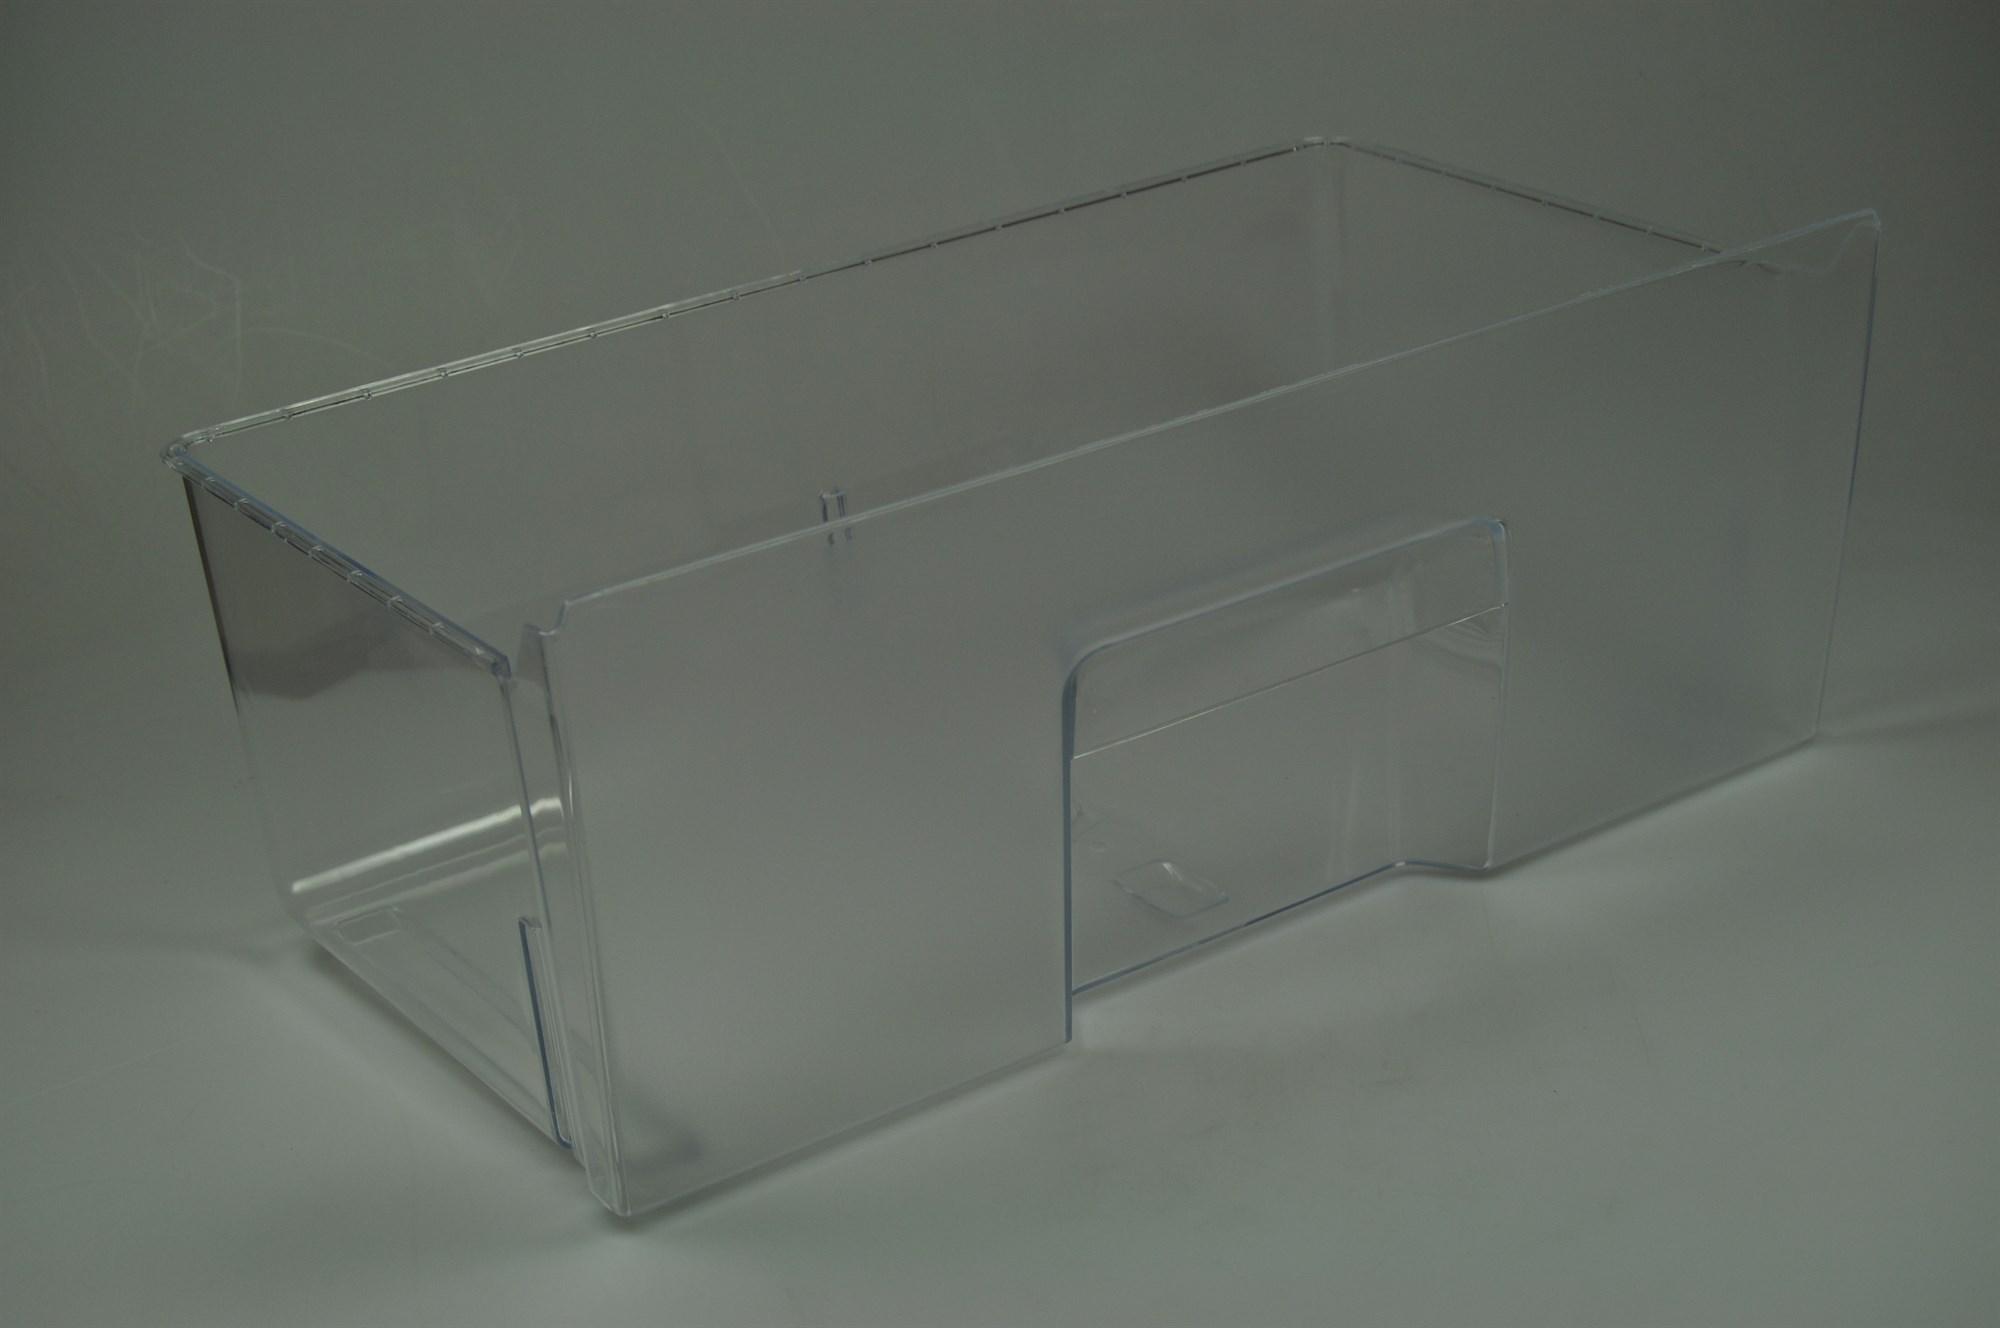 bac l gume gram frigo cong lateur 185mm x 450mm x 260mm. Black Bedroom Furniture Sets. Home Design Ideas